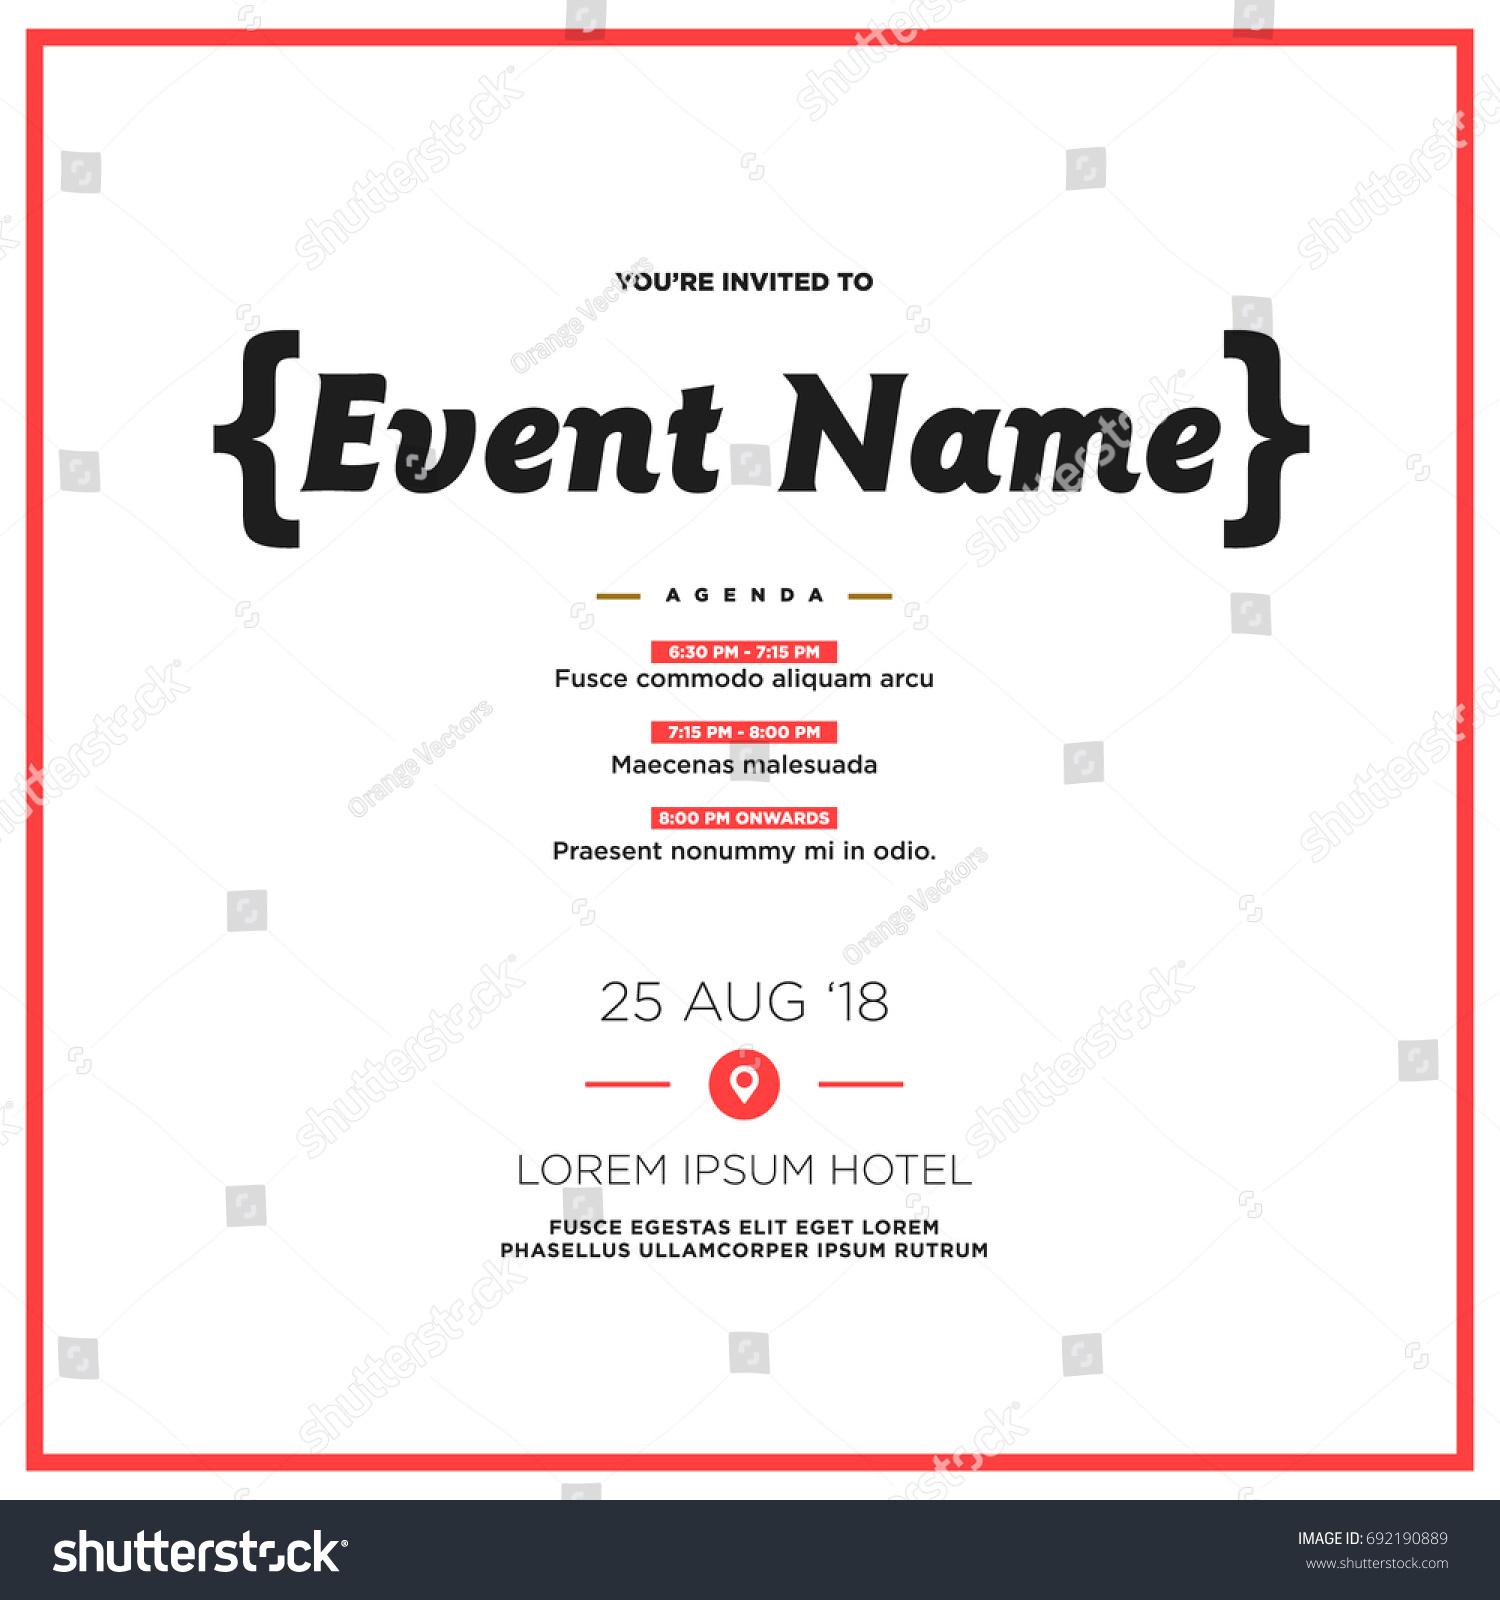 Event invitation template agenda venue date stock vector royalty event invitation template with agenda venue and date details stopboris Choice Image